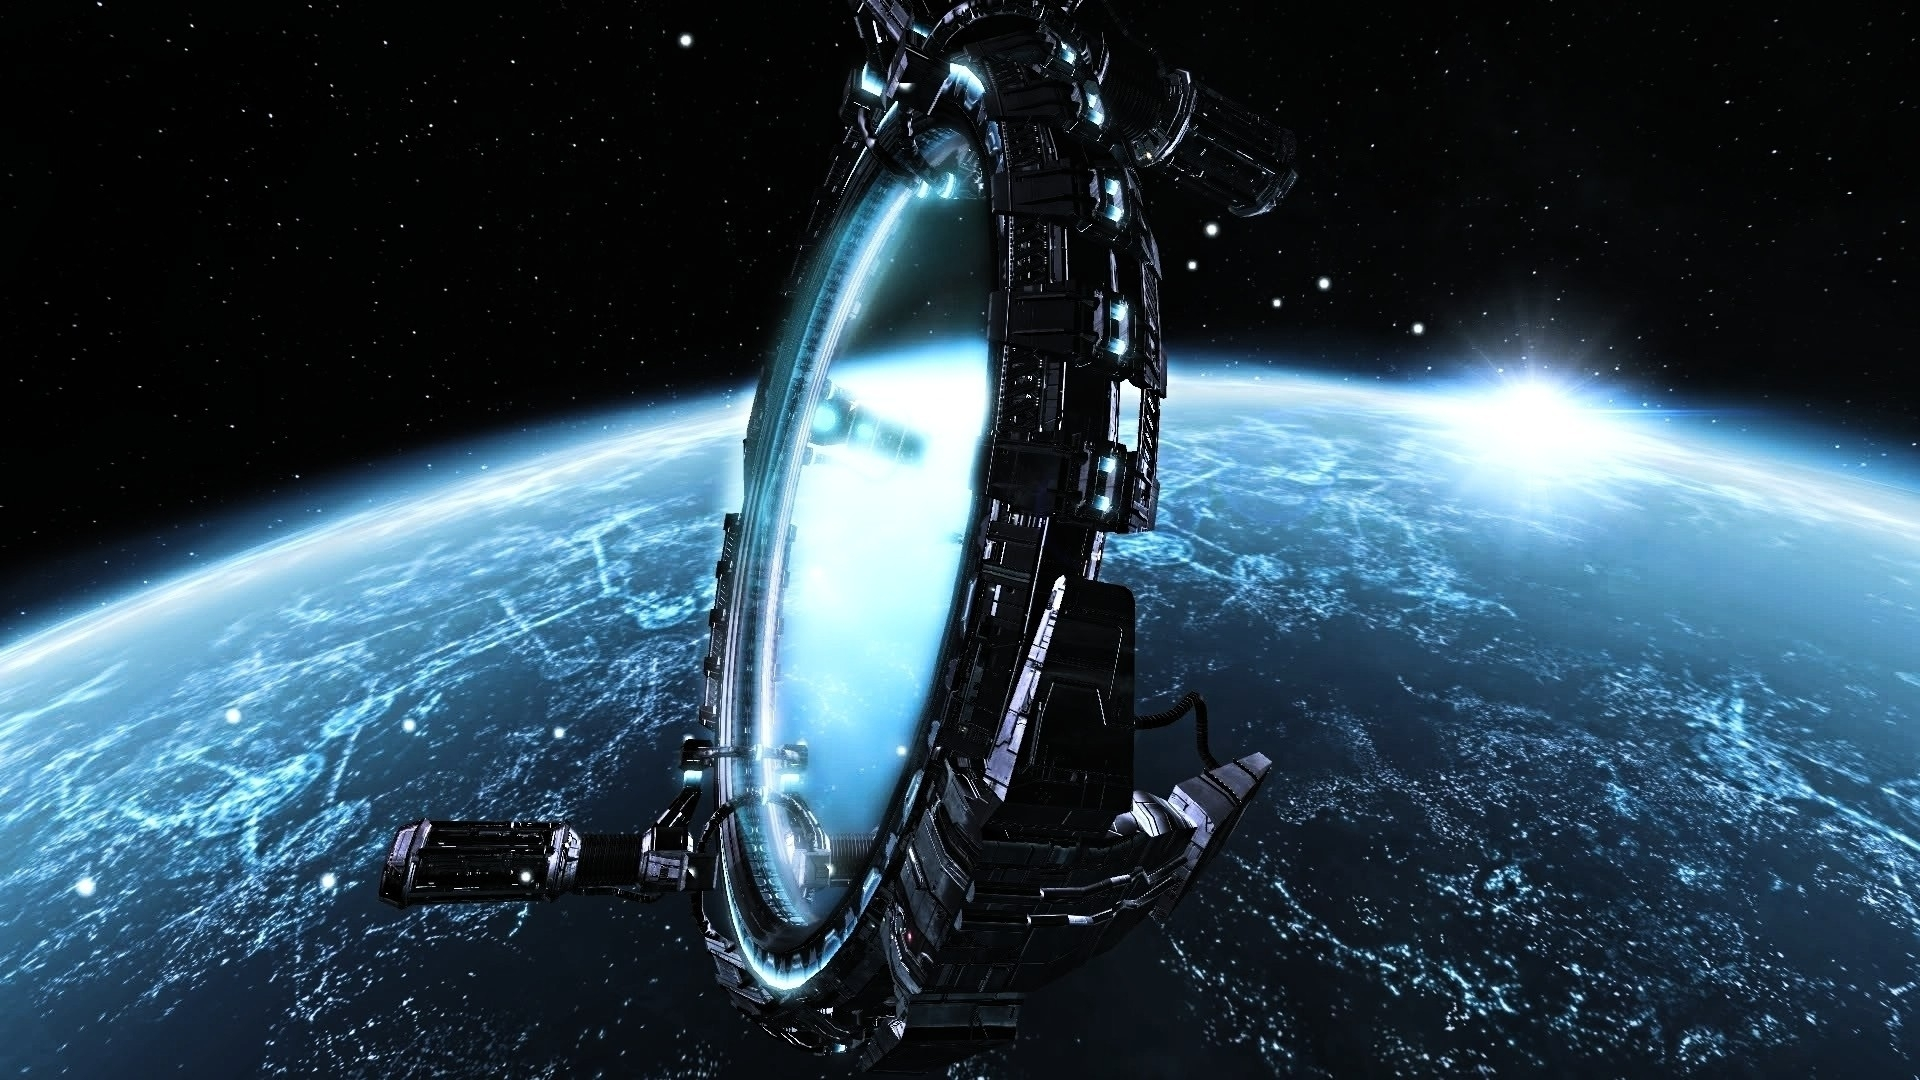 sci fi wallpaper hd resolution free download > subwallpaper